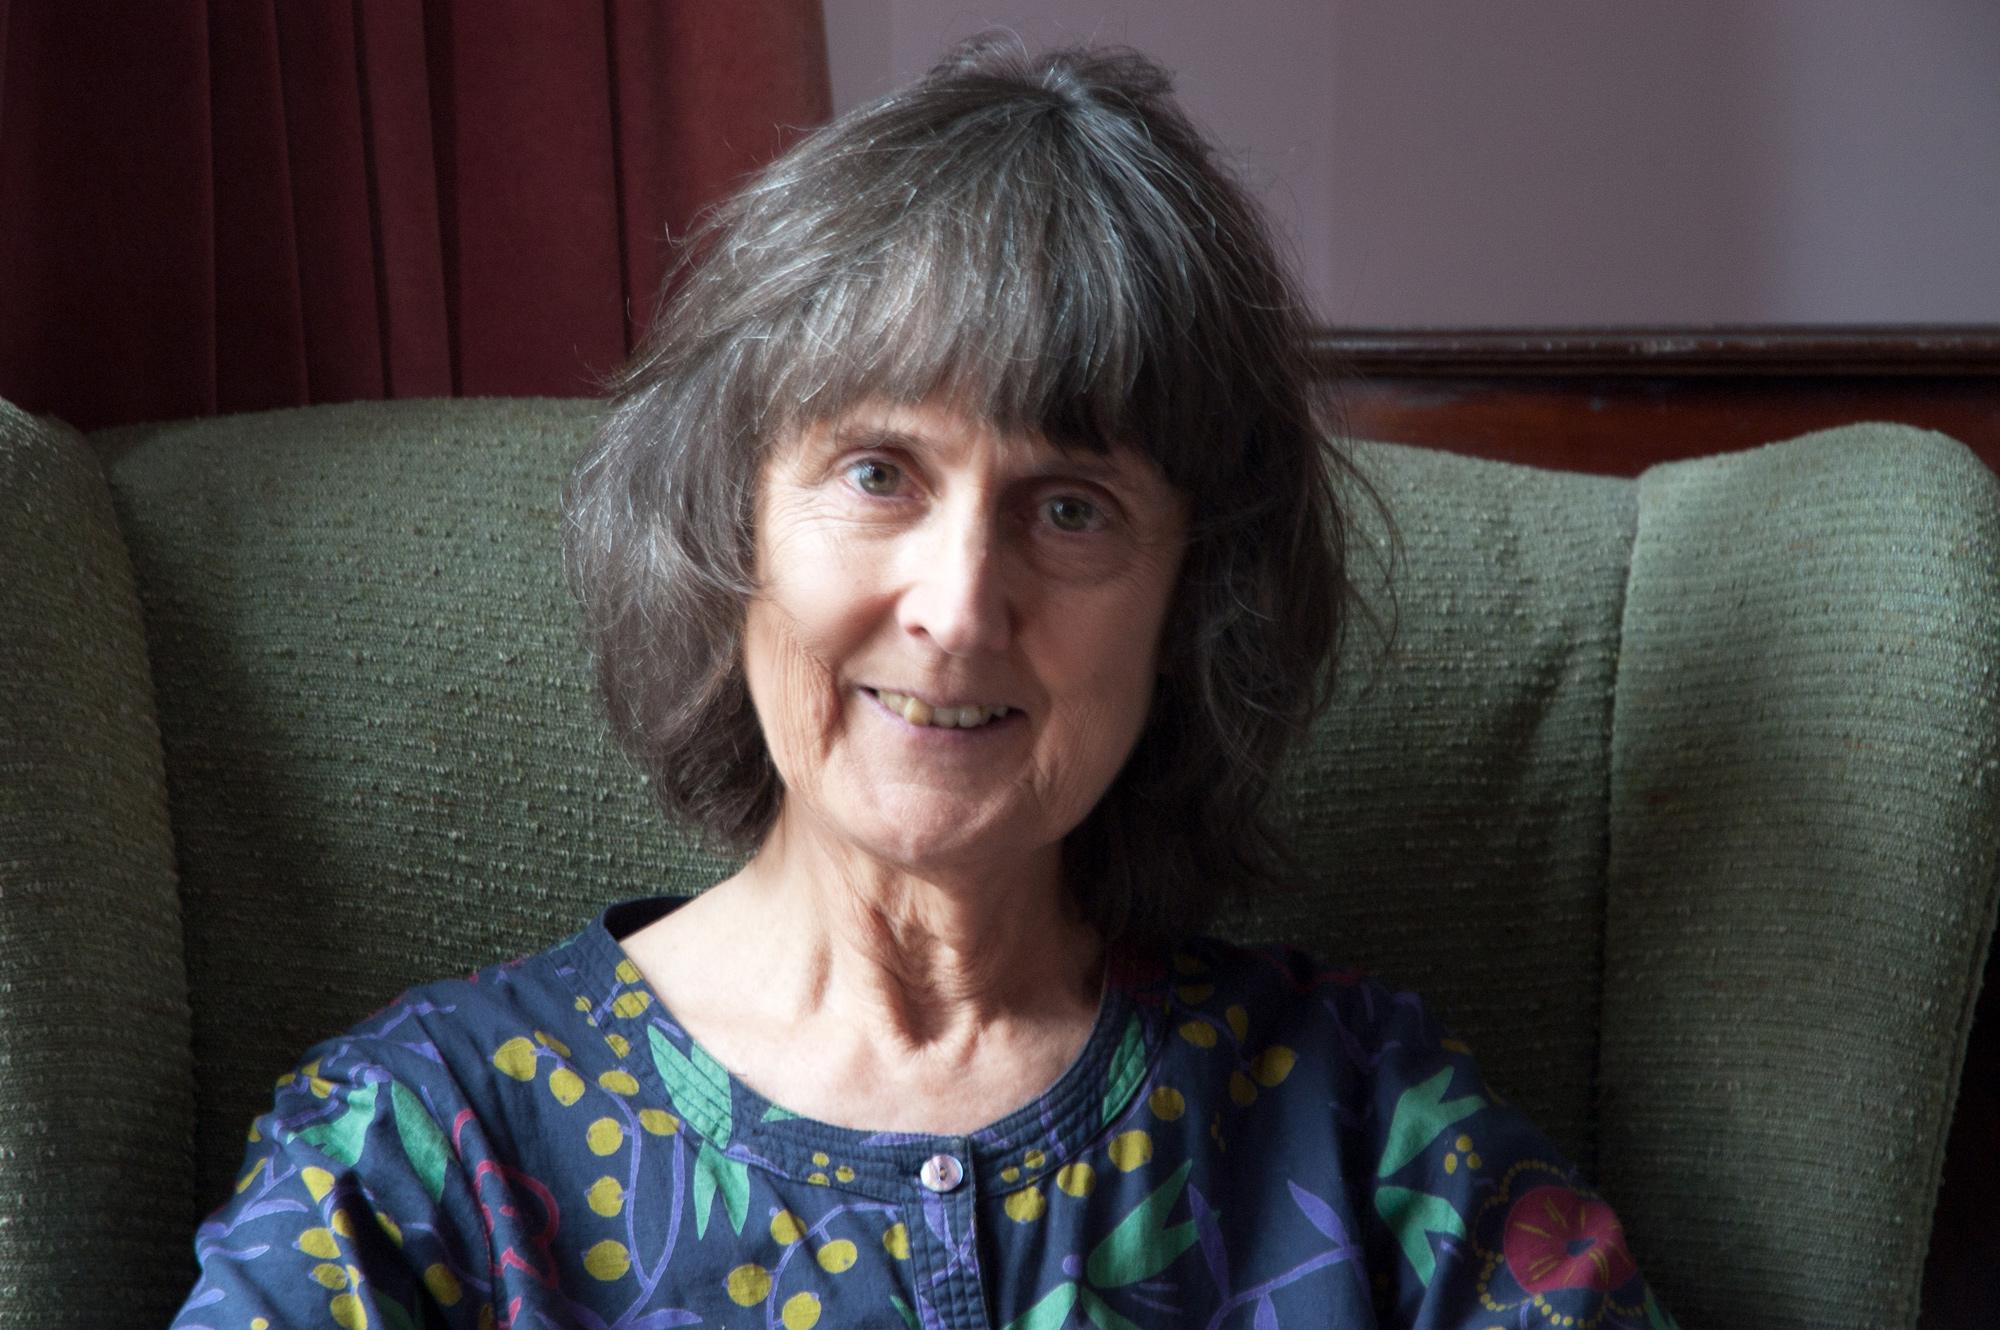 Zoe Fairbairns